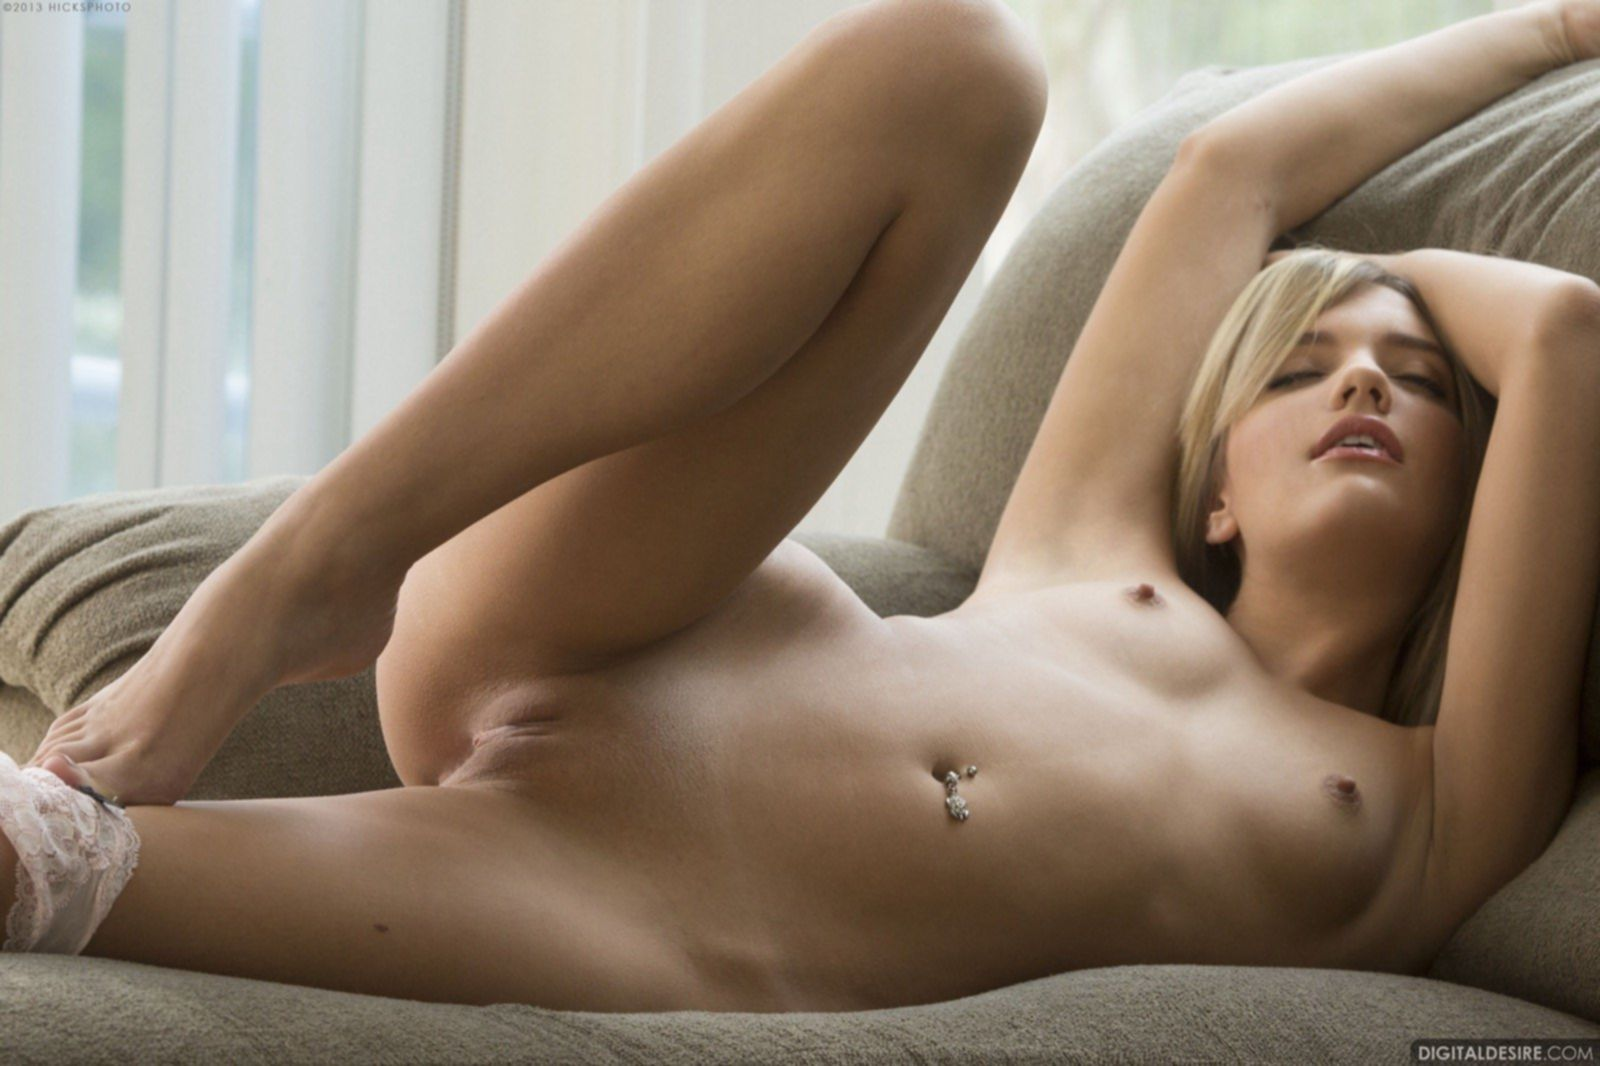 Стройная блондинка красиво сняла трусики - фото